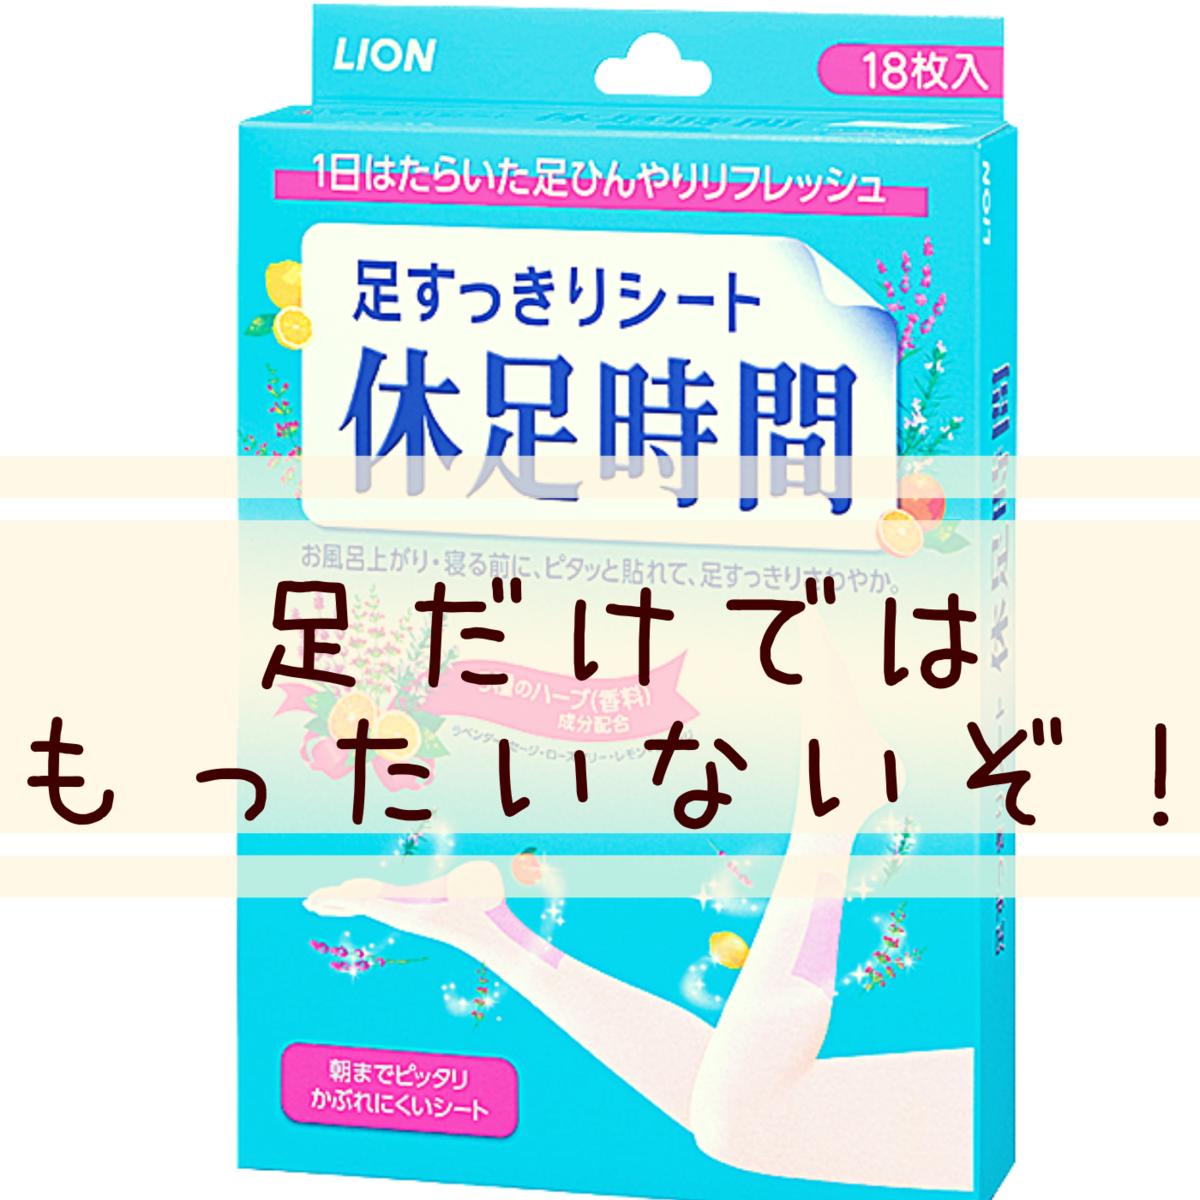 f:id:miyakonbuta:20190519200011p:plain